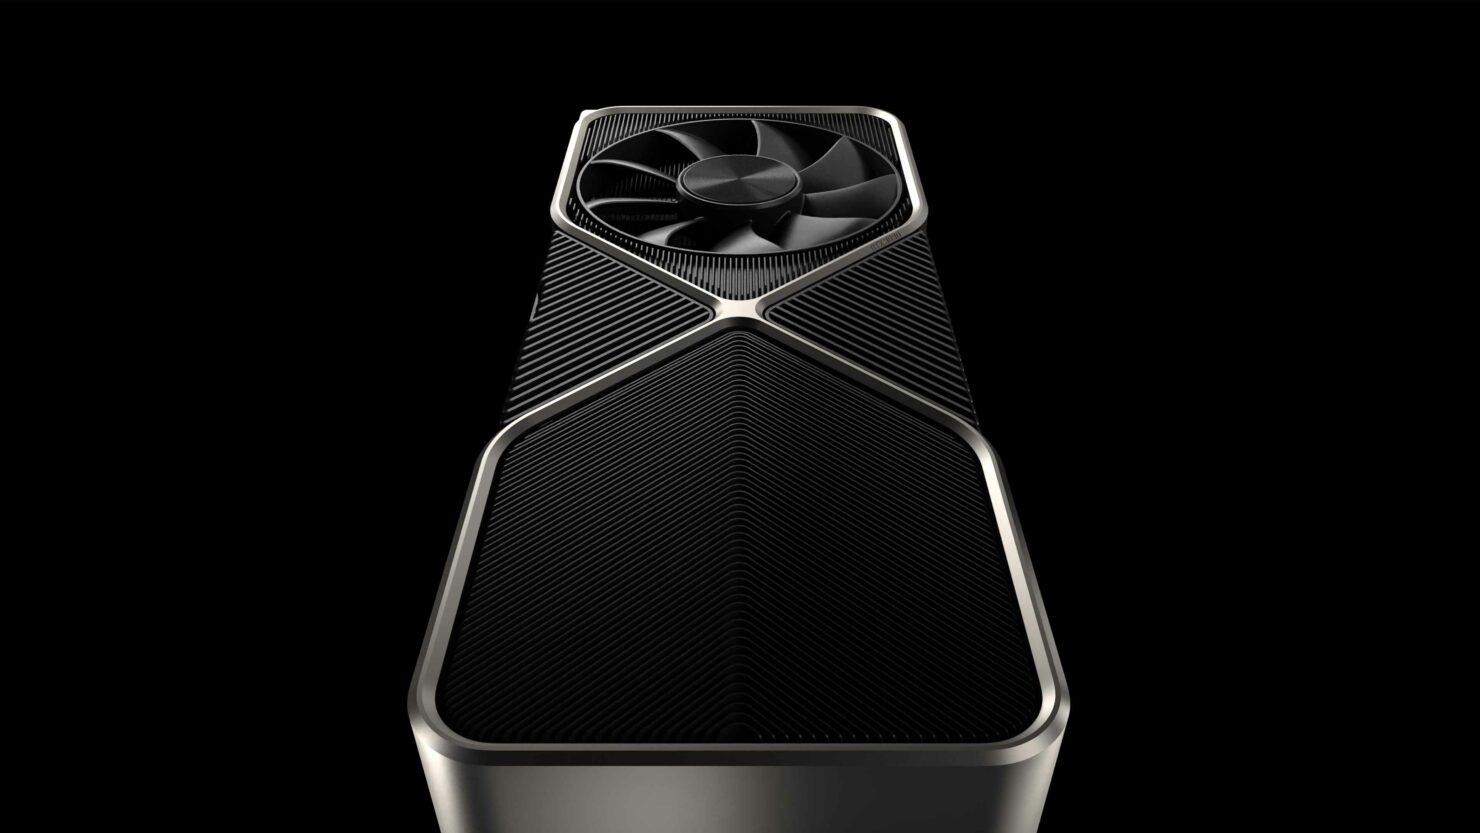 nvidia-geforce-rtx-3090-super-rumored-to-feature-full-ga102-gpu-with-10752-cuda-cores-&-over-400w-tgp